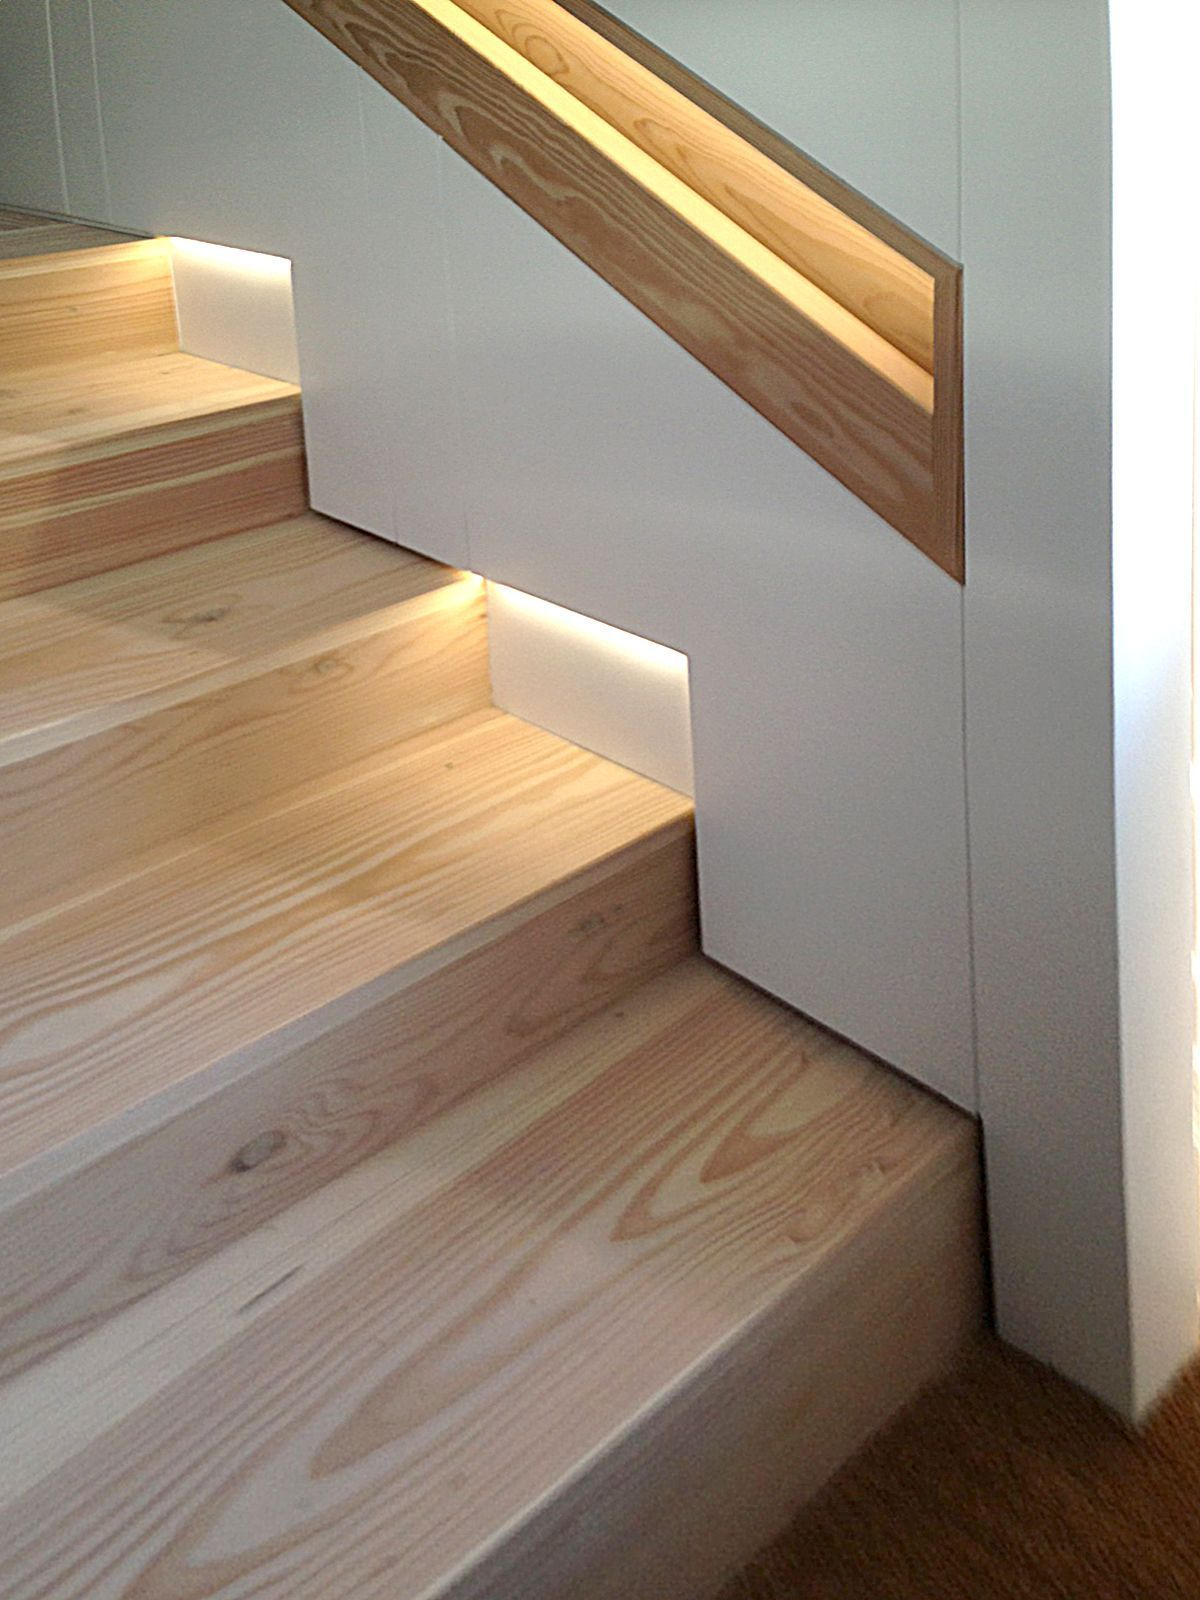 Douglas Fir Pine Treppe Eingangsbereich Treppe Eingangsbereich Treppendekor Handlauf Ideen Rustikale Treppe